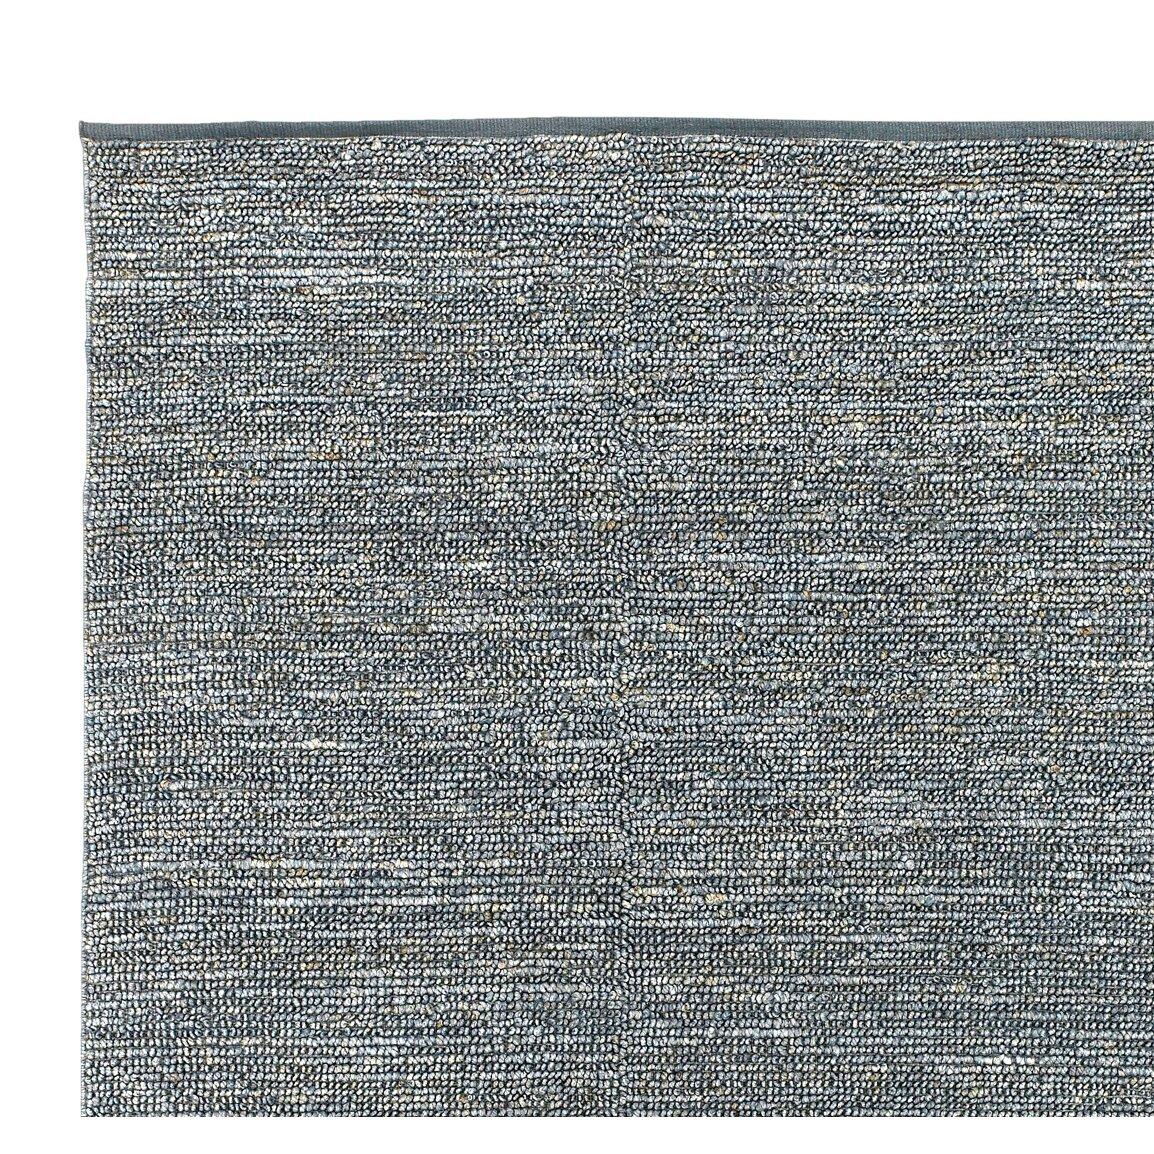 rugs area rugs 2 39 x 3 39 area rugs dwellstudio sku dwl4672